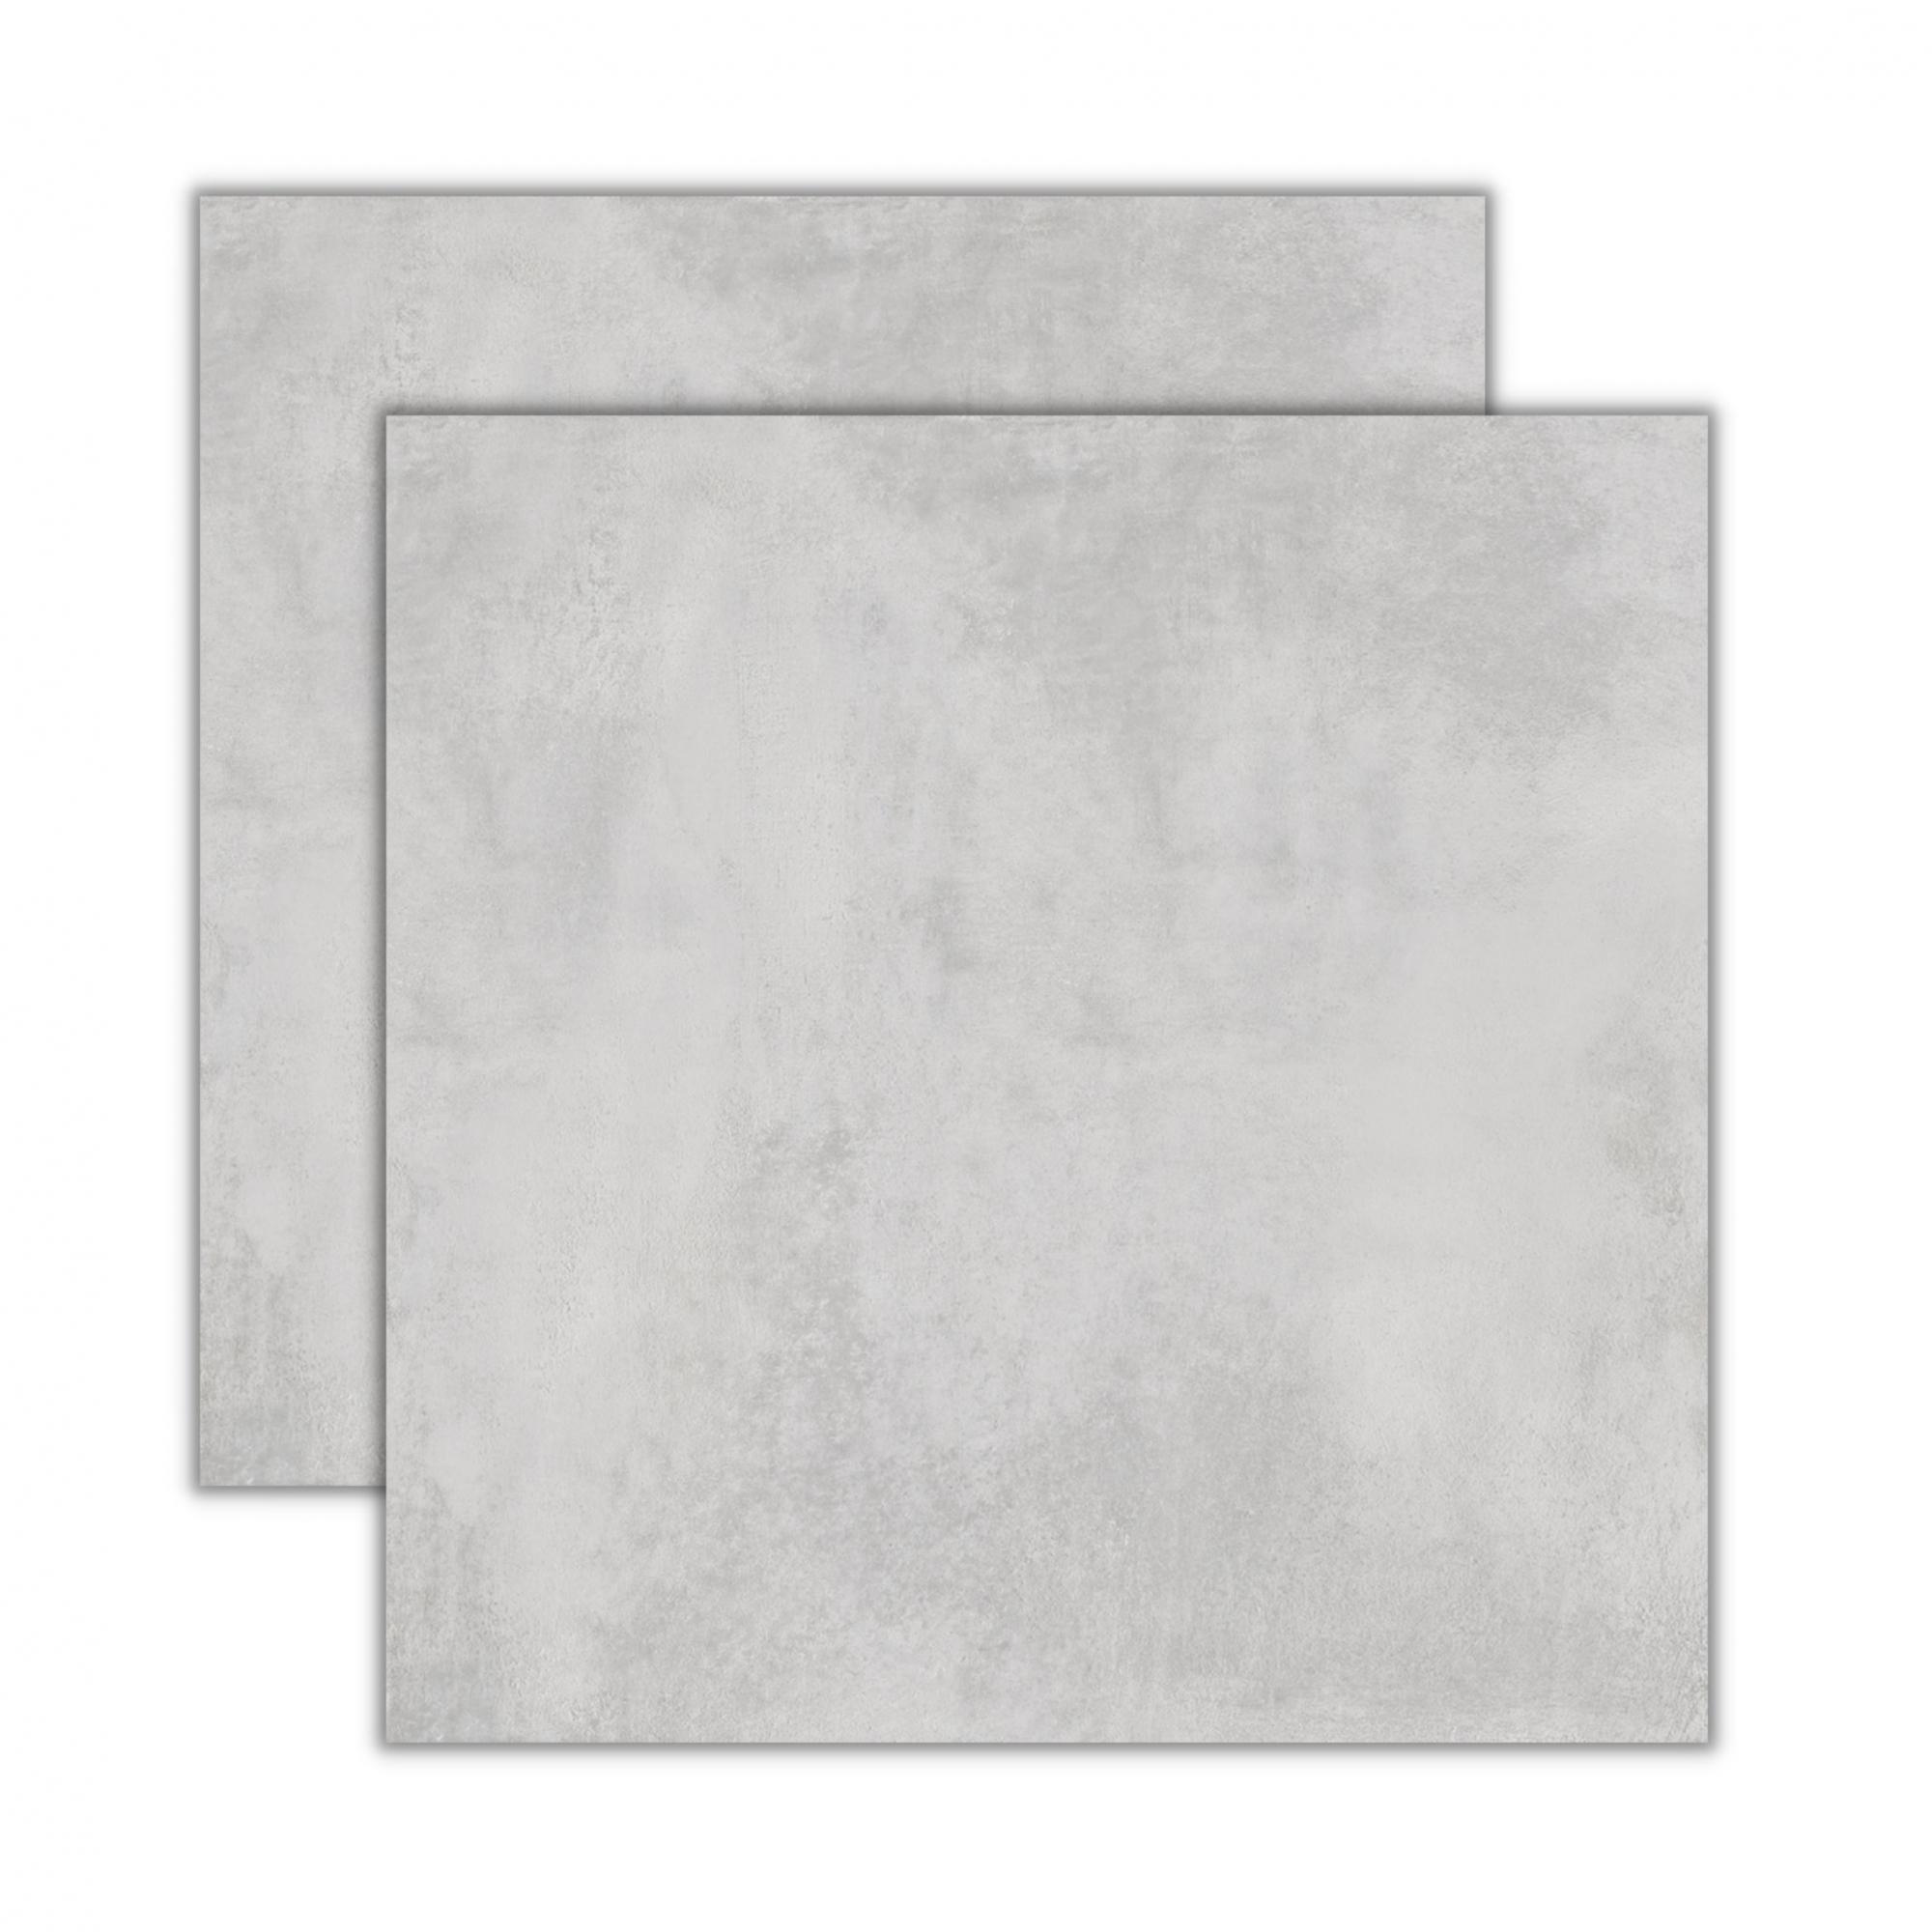 Studio Grey 90x90cm <br /><b>R$ 78,00 M² </b><br />Cx 2,40 M² <b>  R$ 187,20</b>